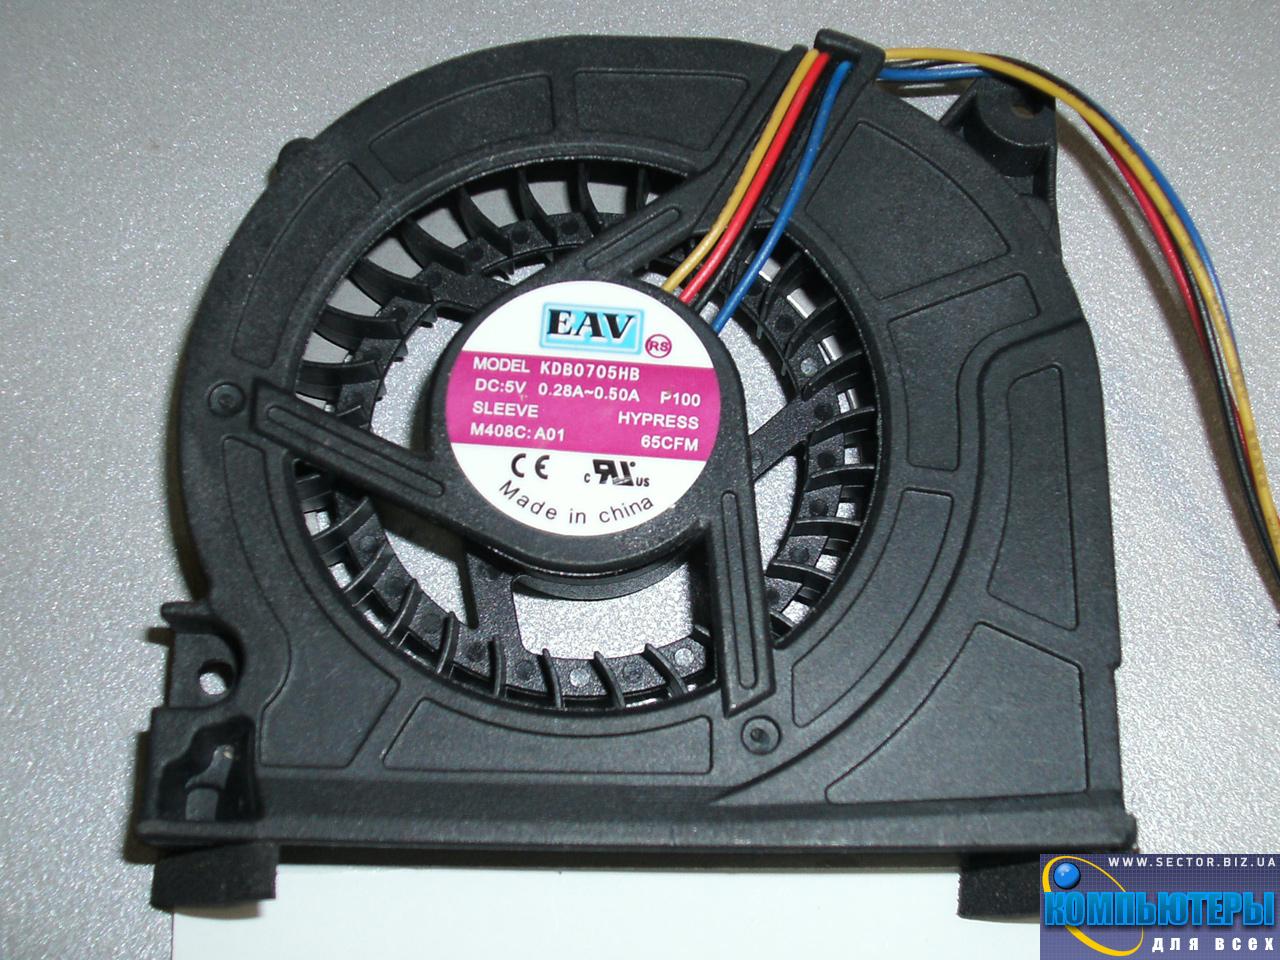 Кулер к ноутбуку Lenovo Y510 Y520 Y530 F51 p/n: KDB0705HB. Фото № 5.